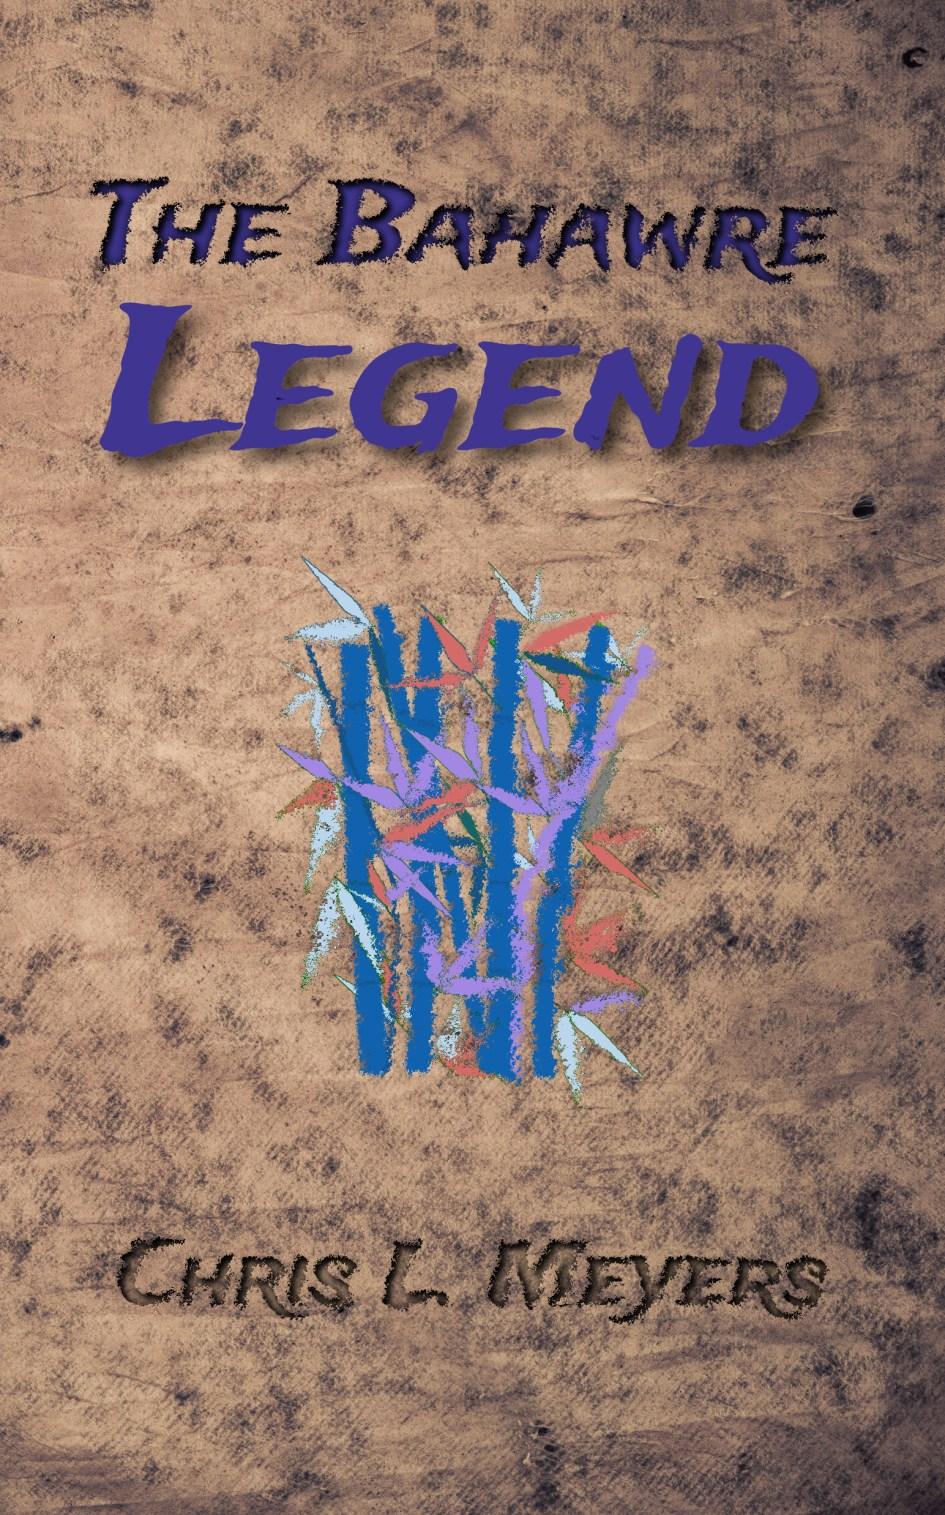 The Bahawre Legend cover